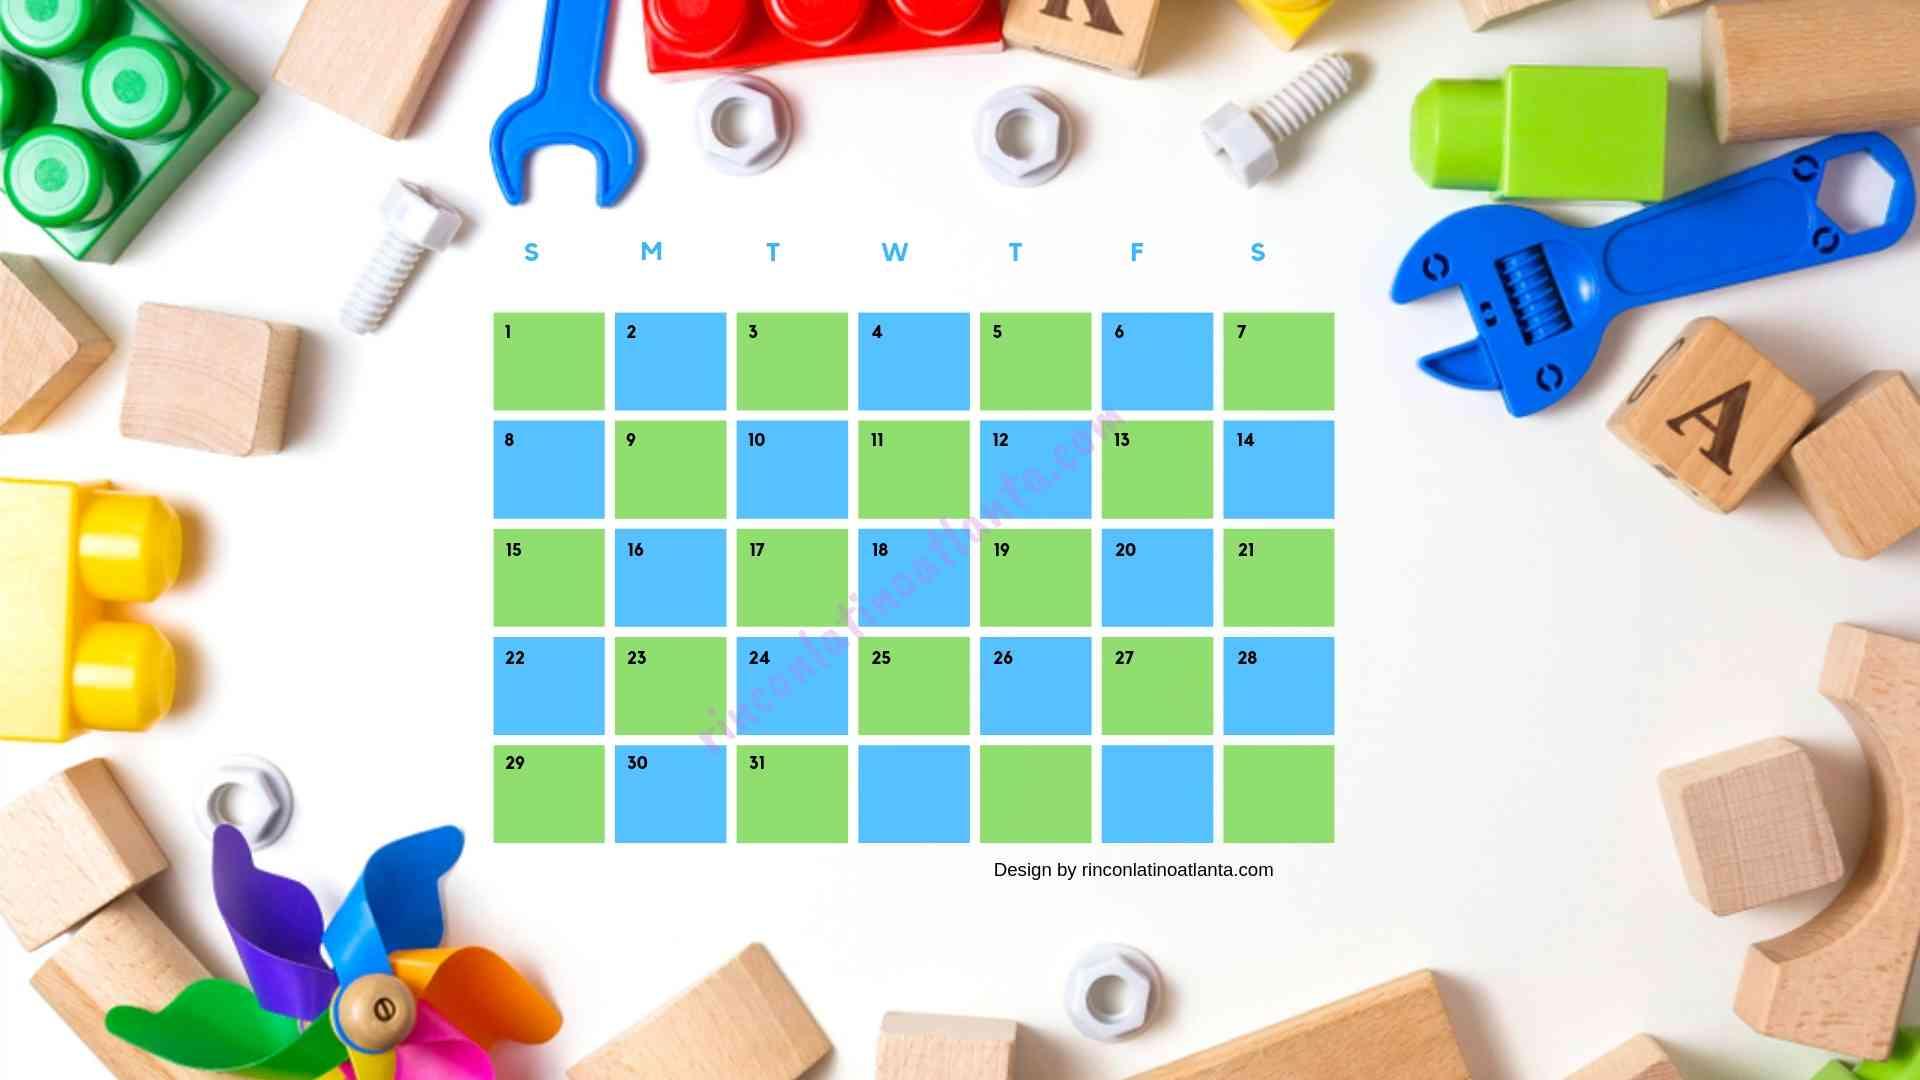 Five Kindergarten Countdown Calendar With Toys Background